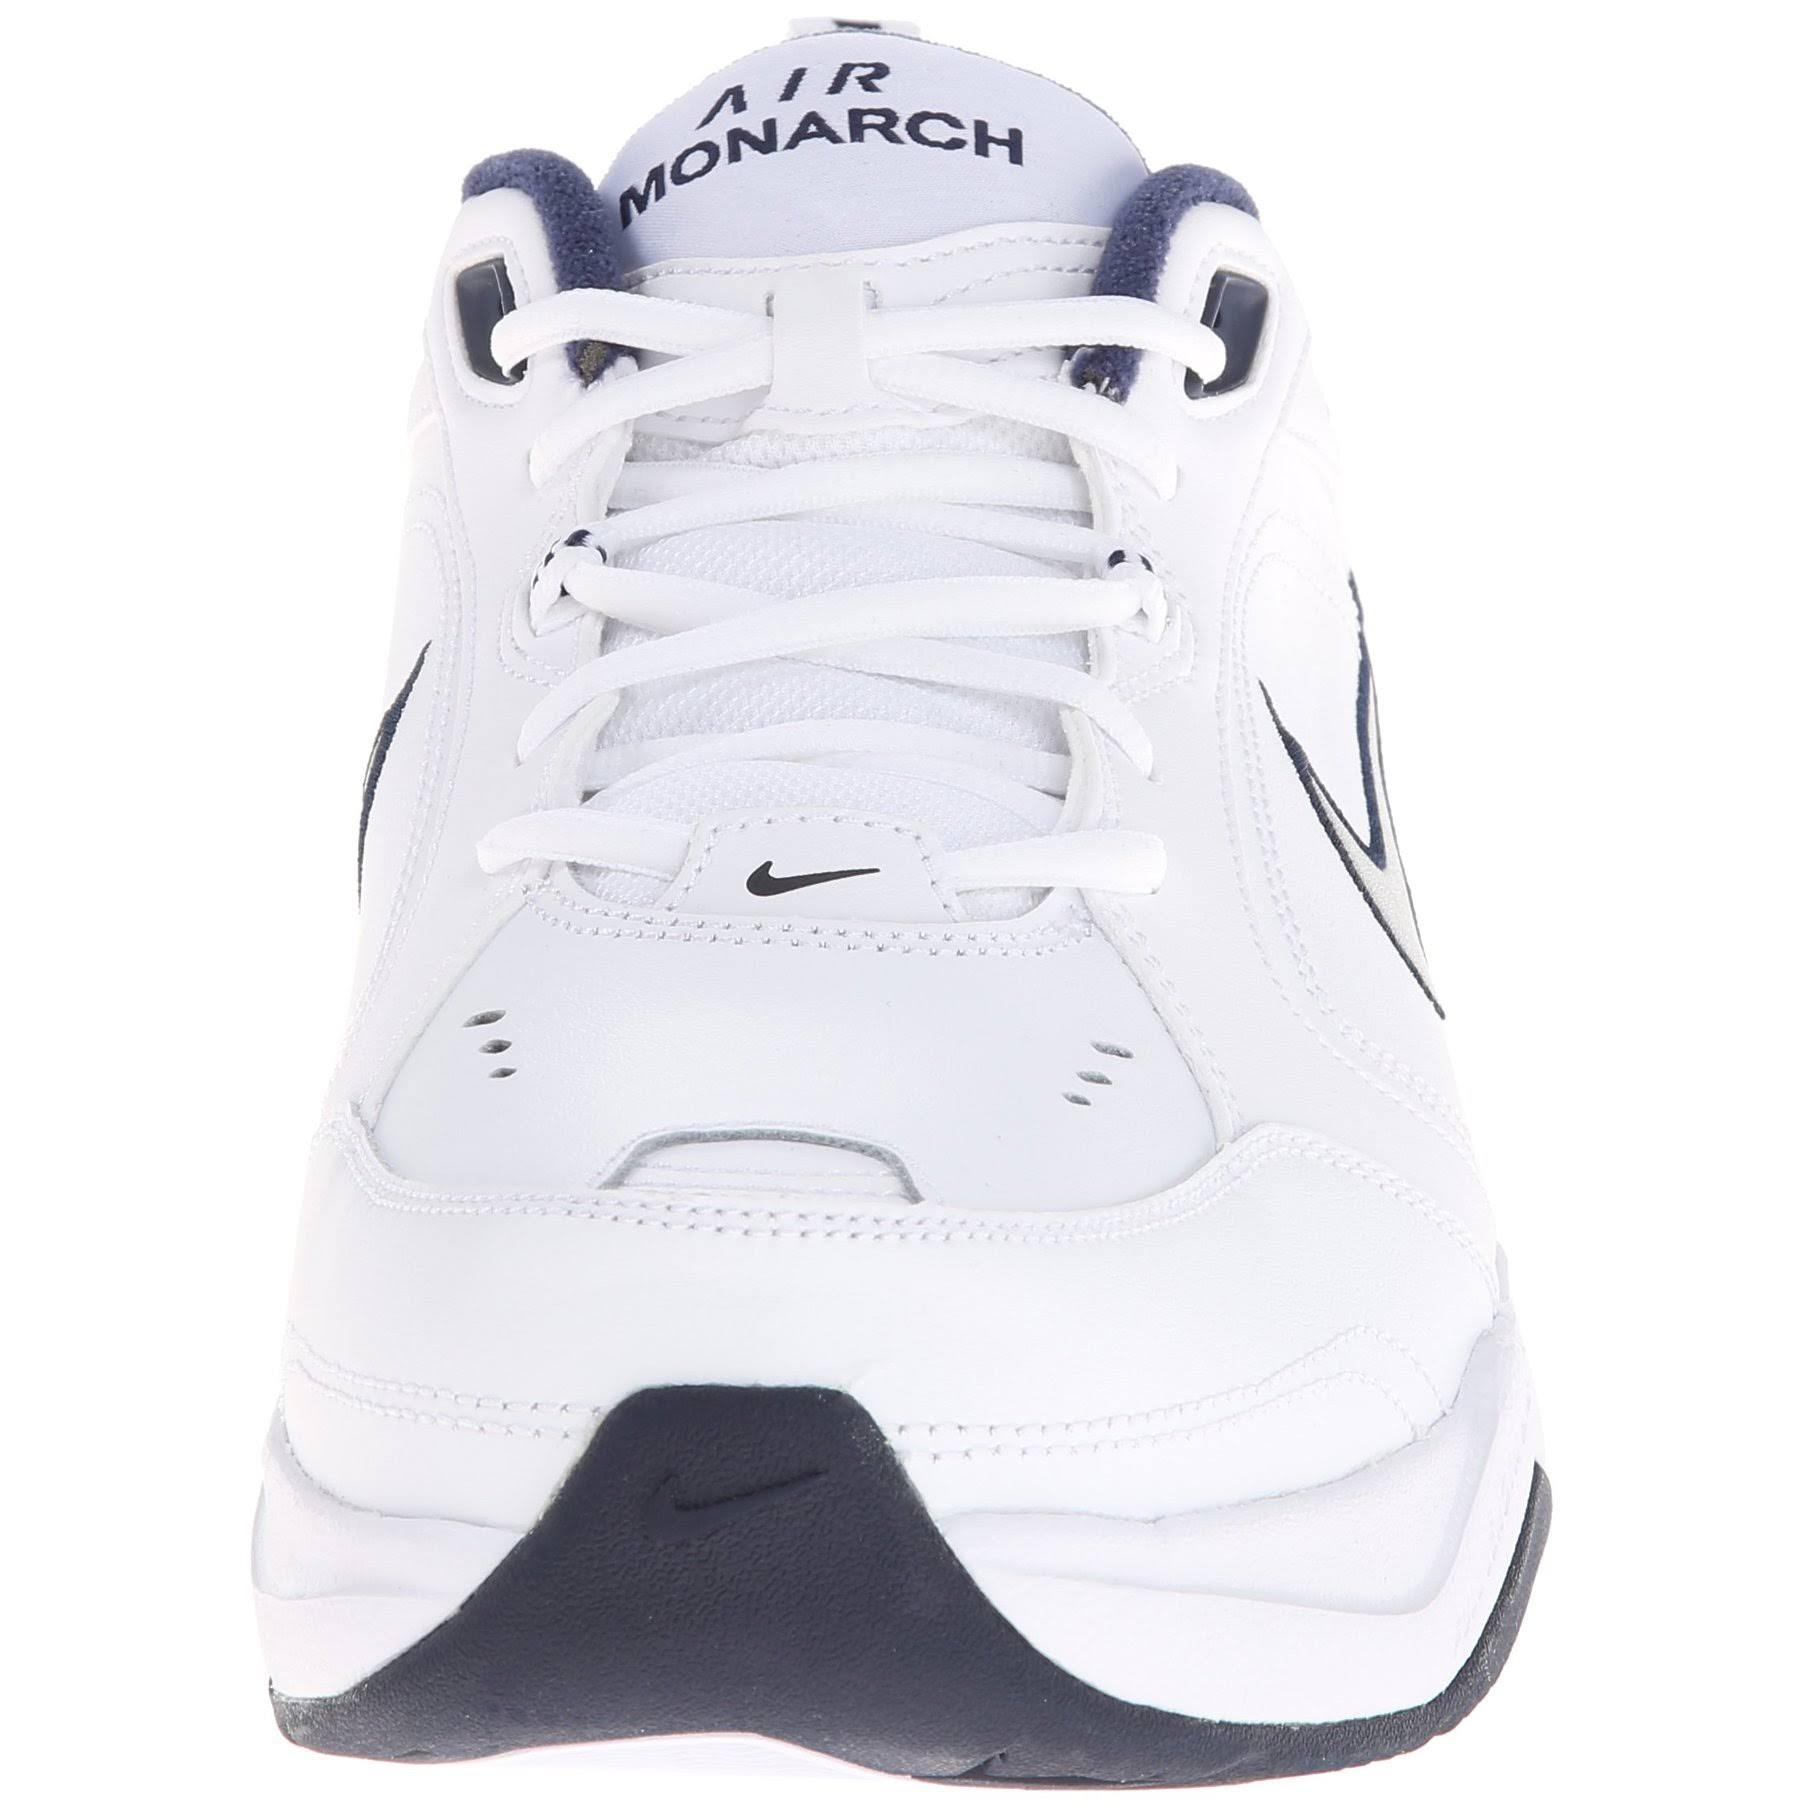 Air MonarchMisura Uomo 11 Da Nike Mens 5Nero R54jL3Aq